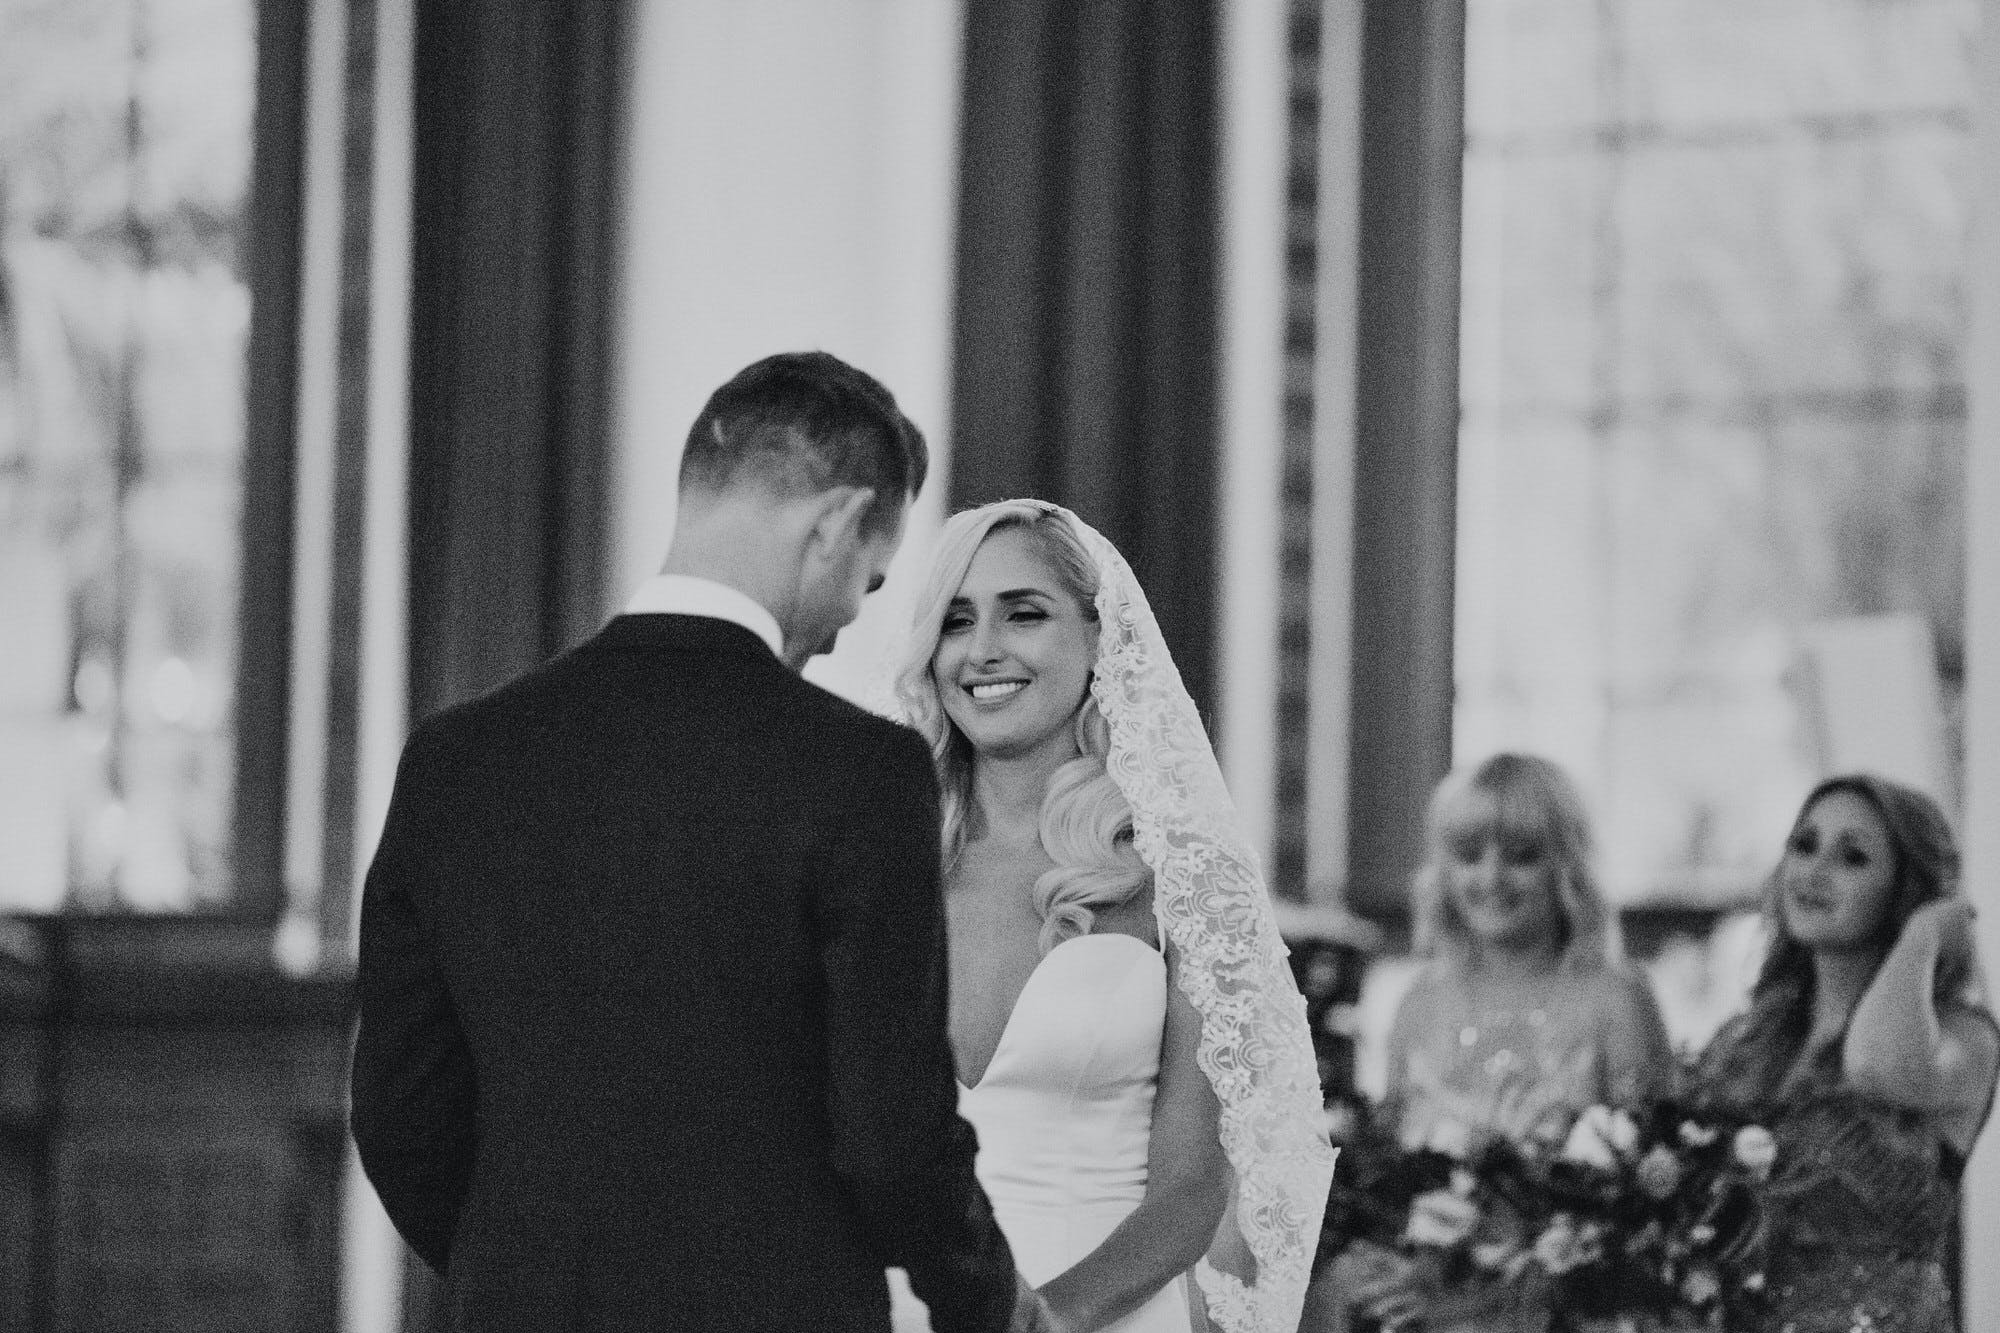 candid wedding photography team